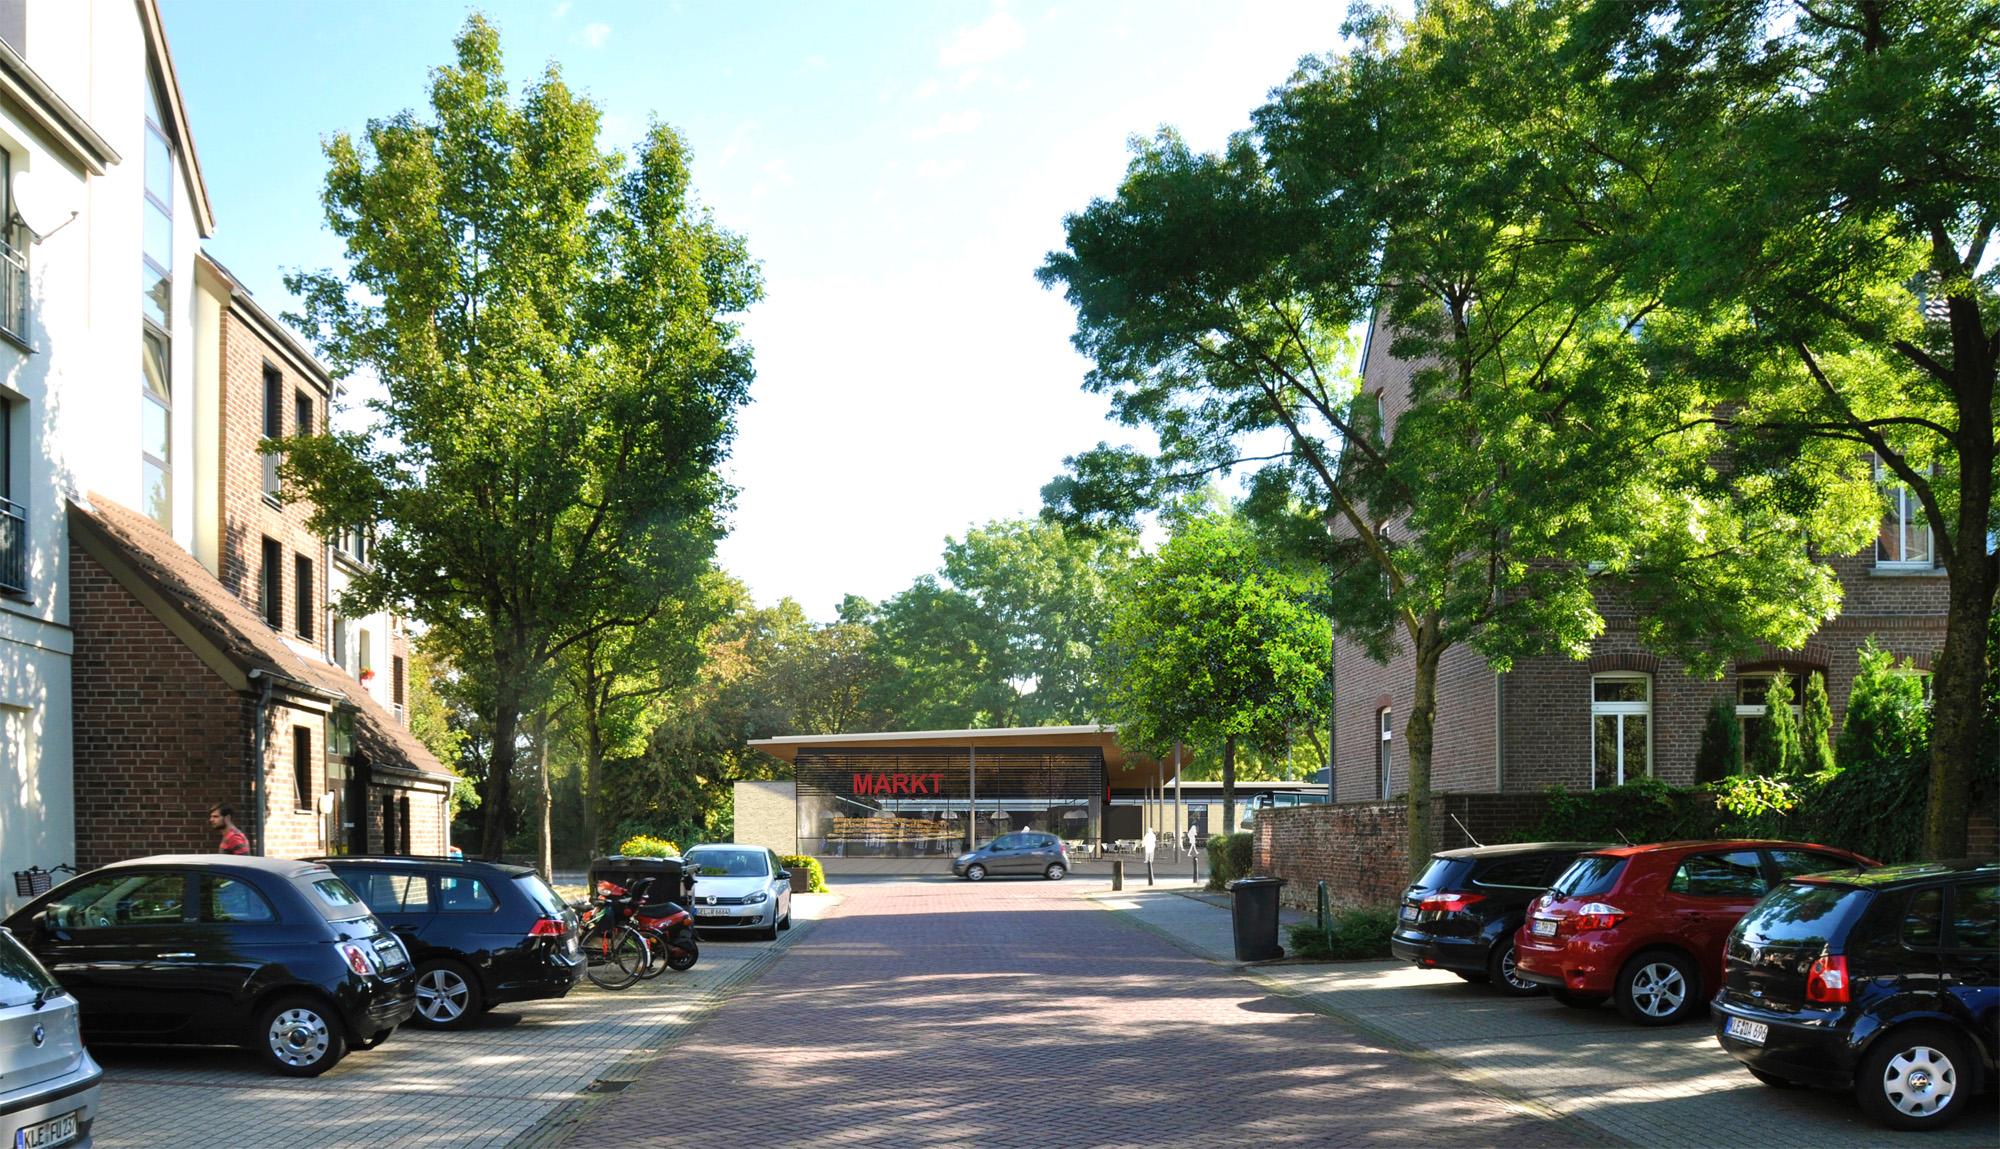 Perspektive De-Cabanes-Straße